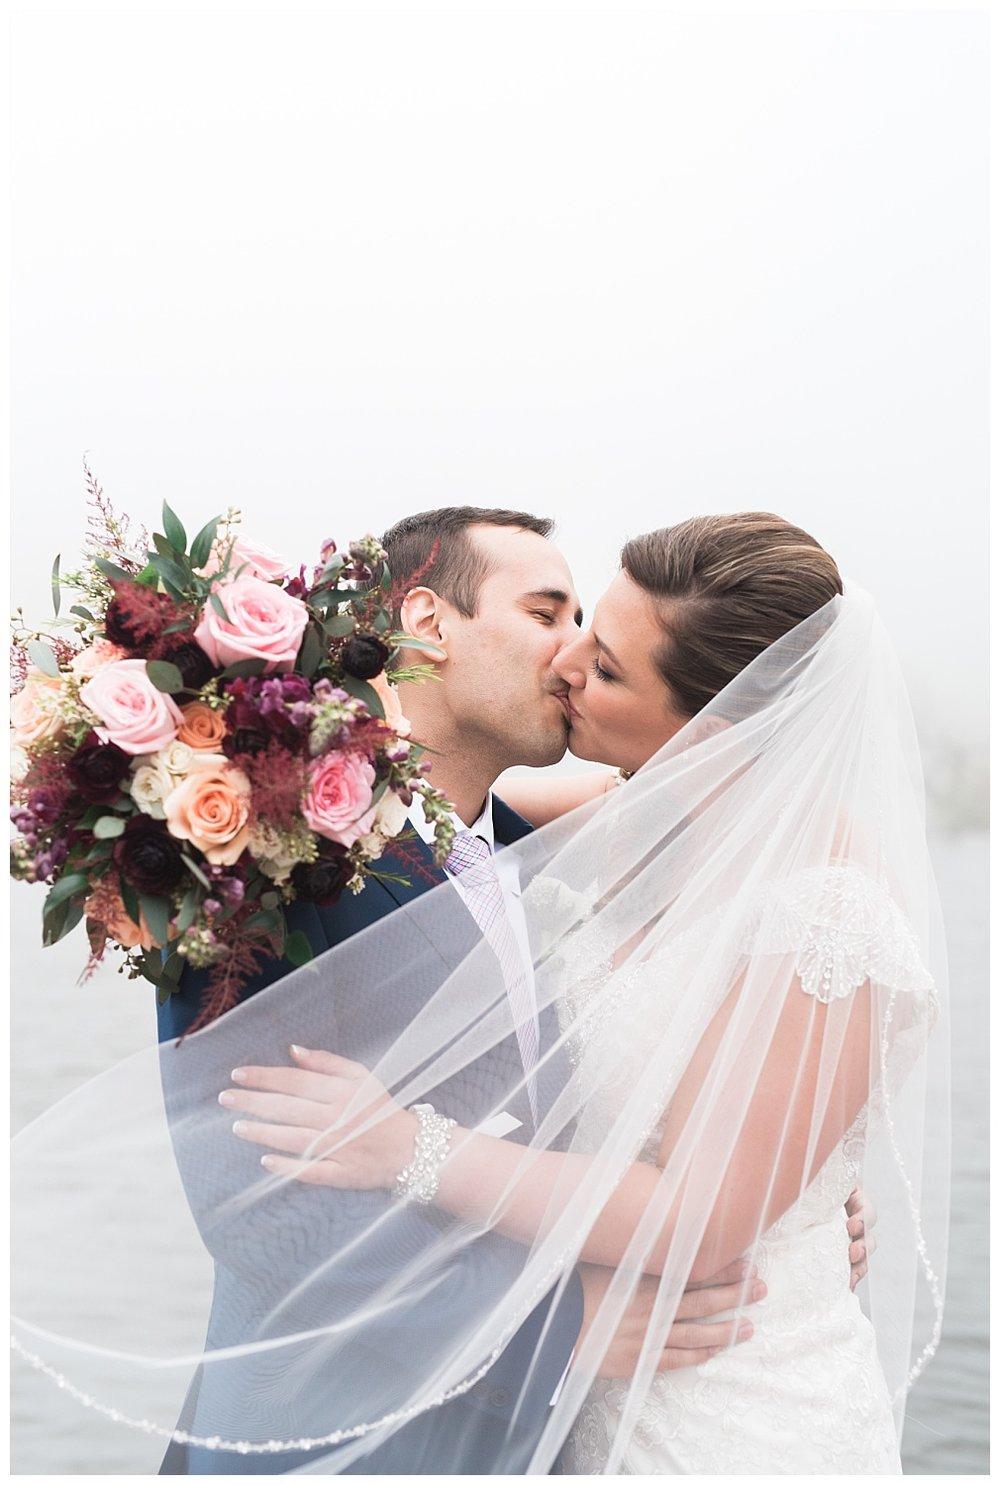 NJ-Wedding-Rock-Island-Lake-Club-Sparta-Navy-Blush-Photographer-Photo-050.JPG